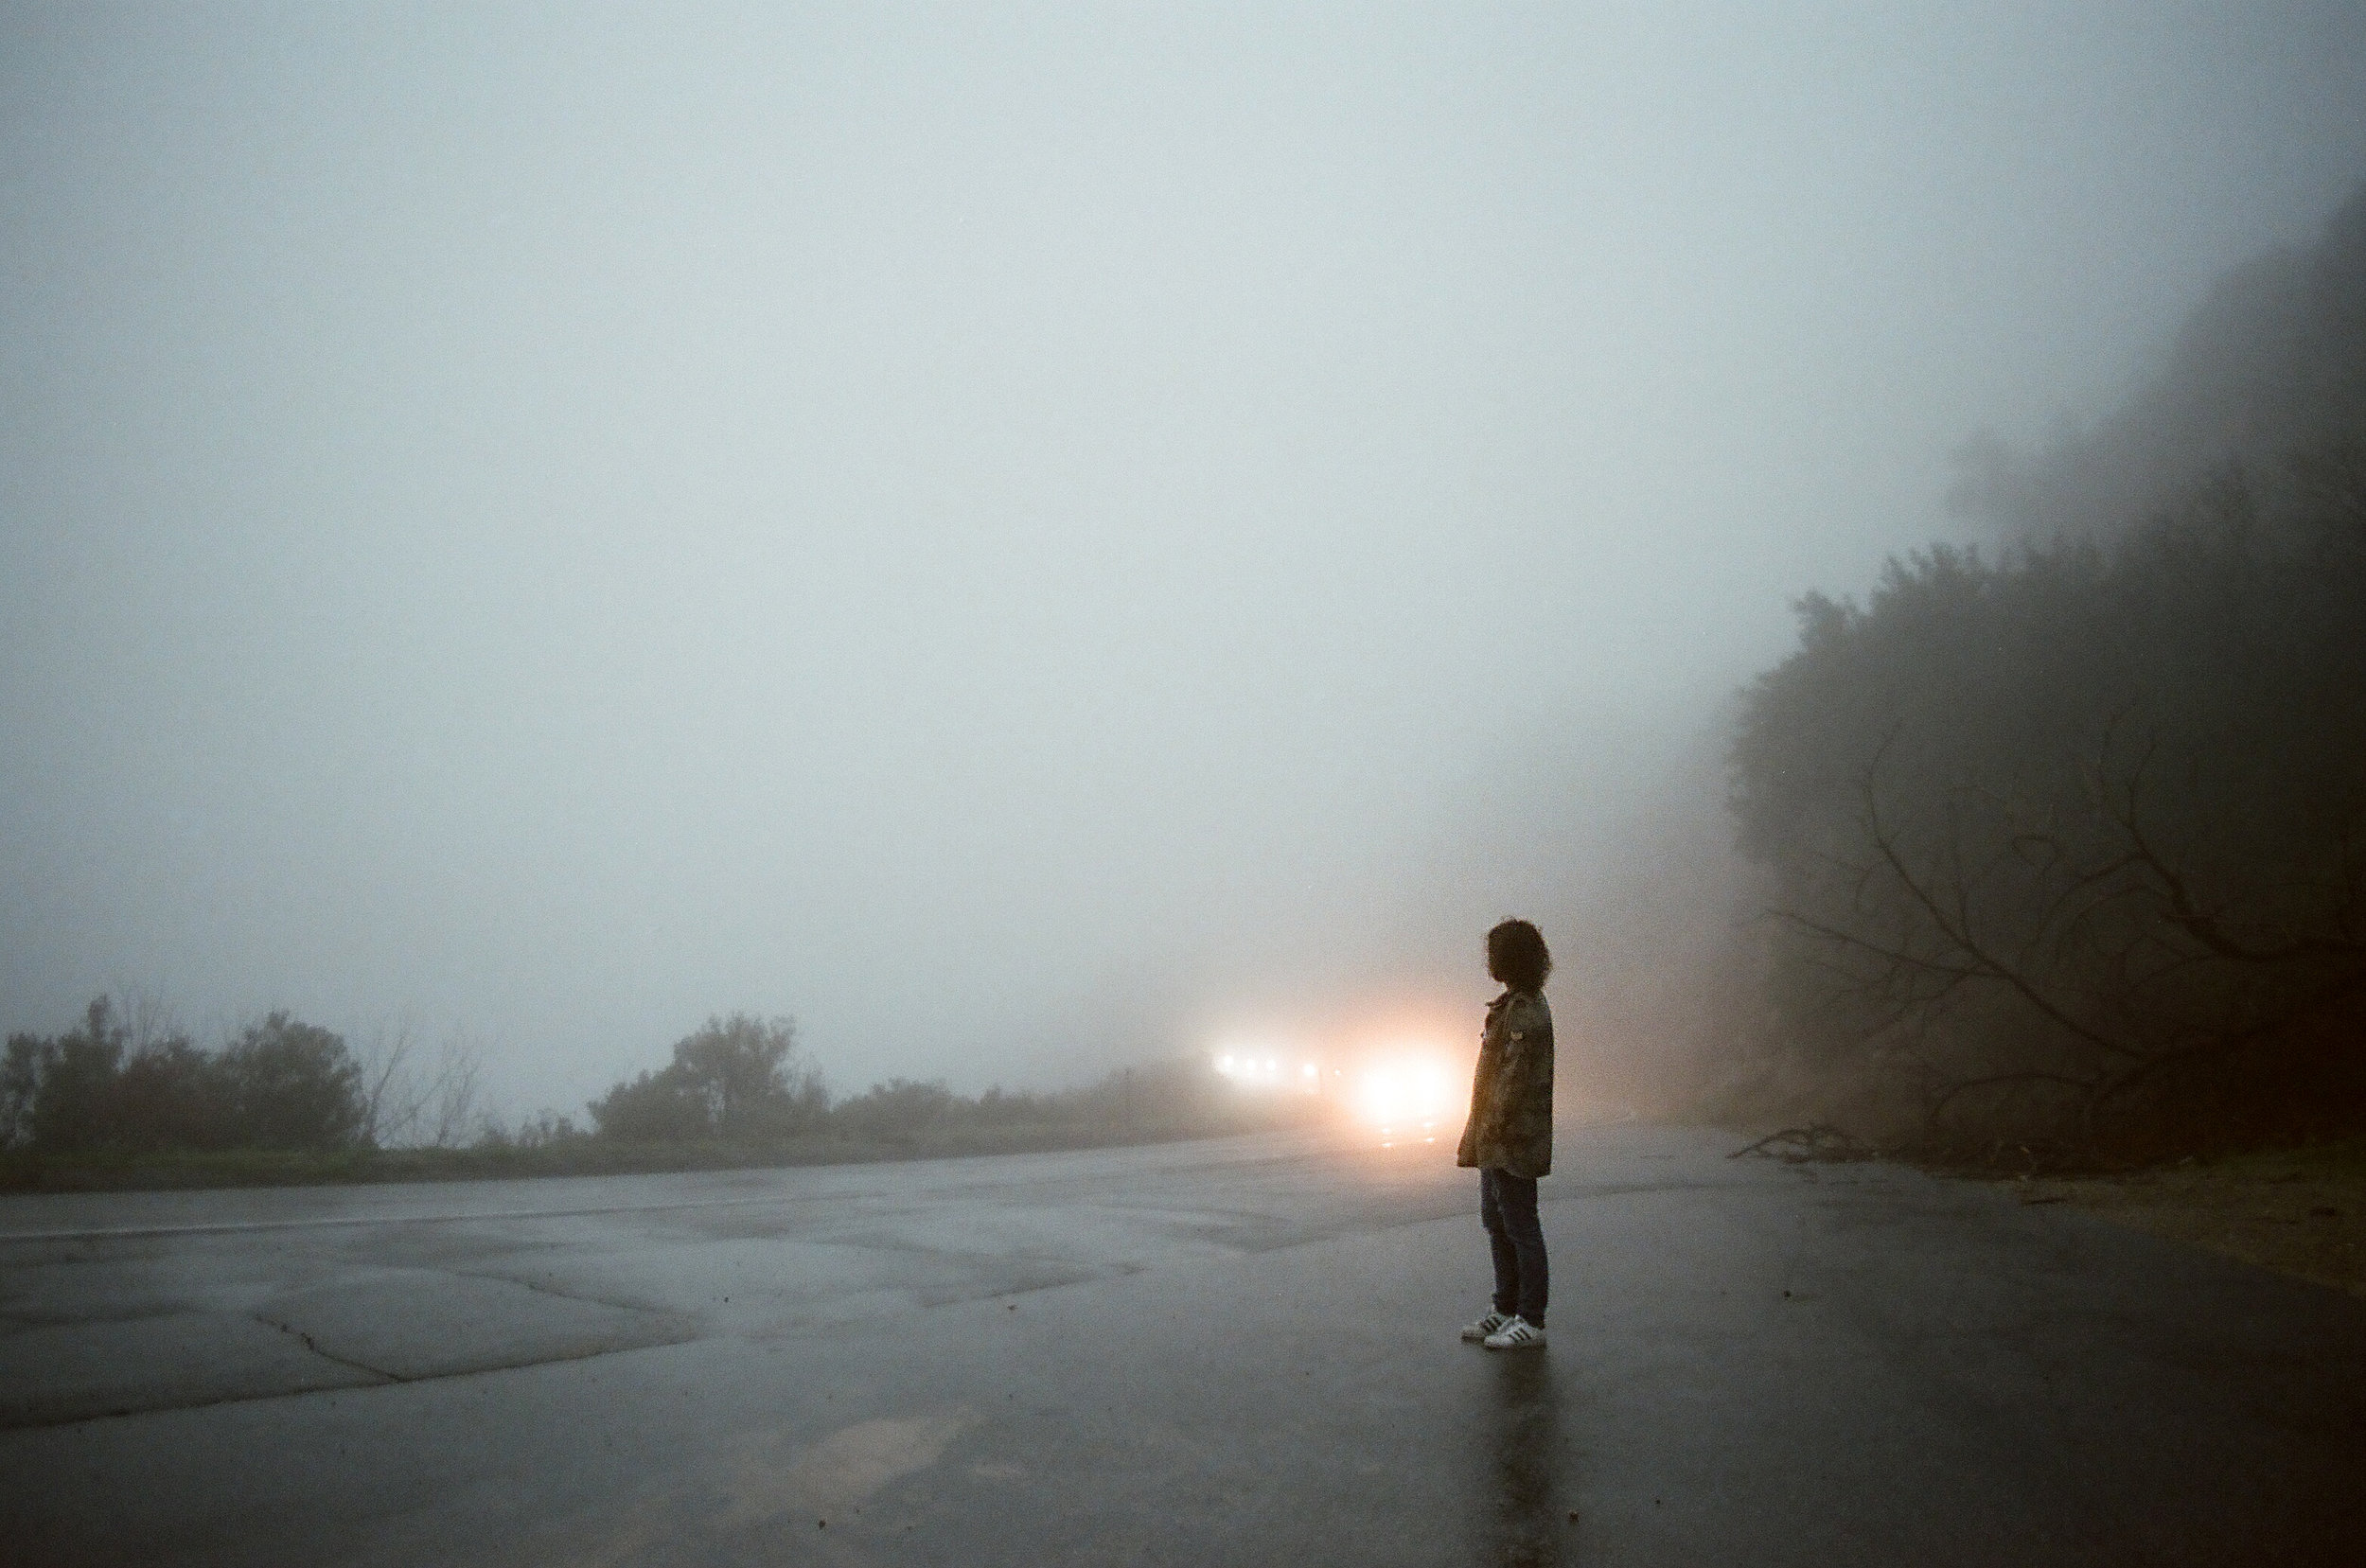 Foggy Highway | Canon AE1 | FD 28mm | Fuji Pro 400 | Angela Pailevanian